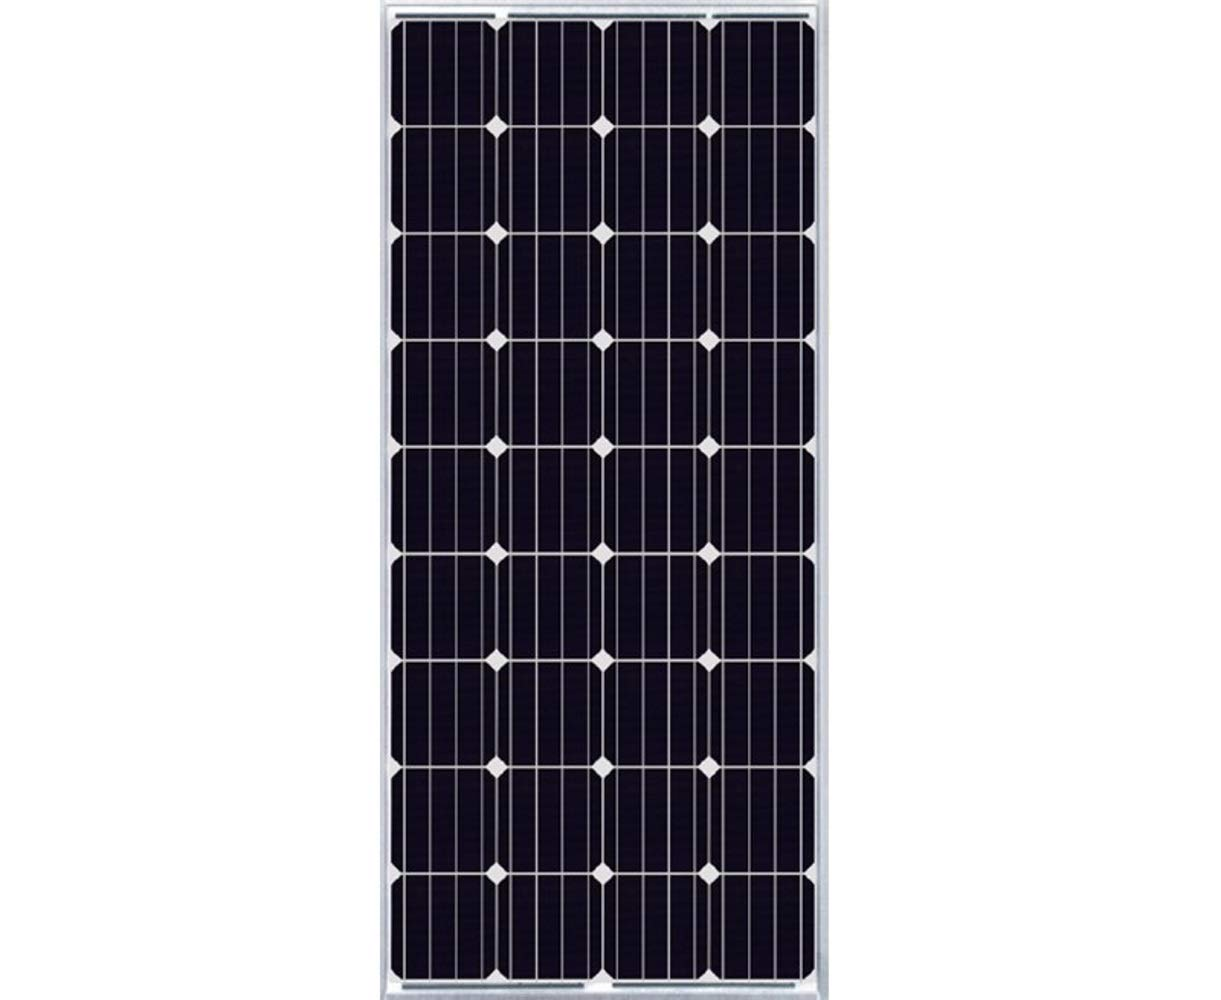 Solarvention 180 Watt 12 Volt Monocrystalline Solar Panel